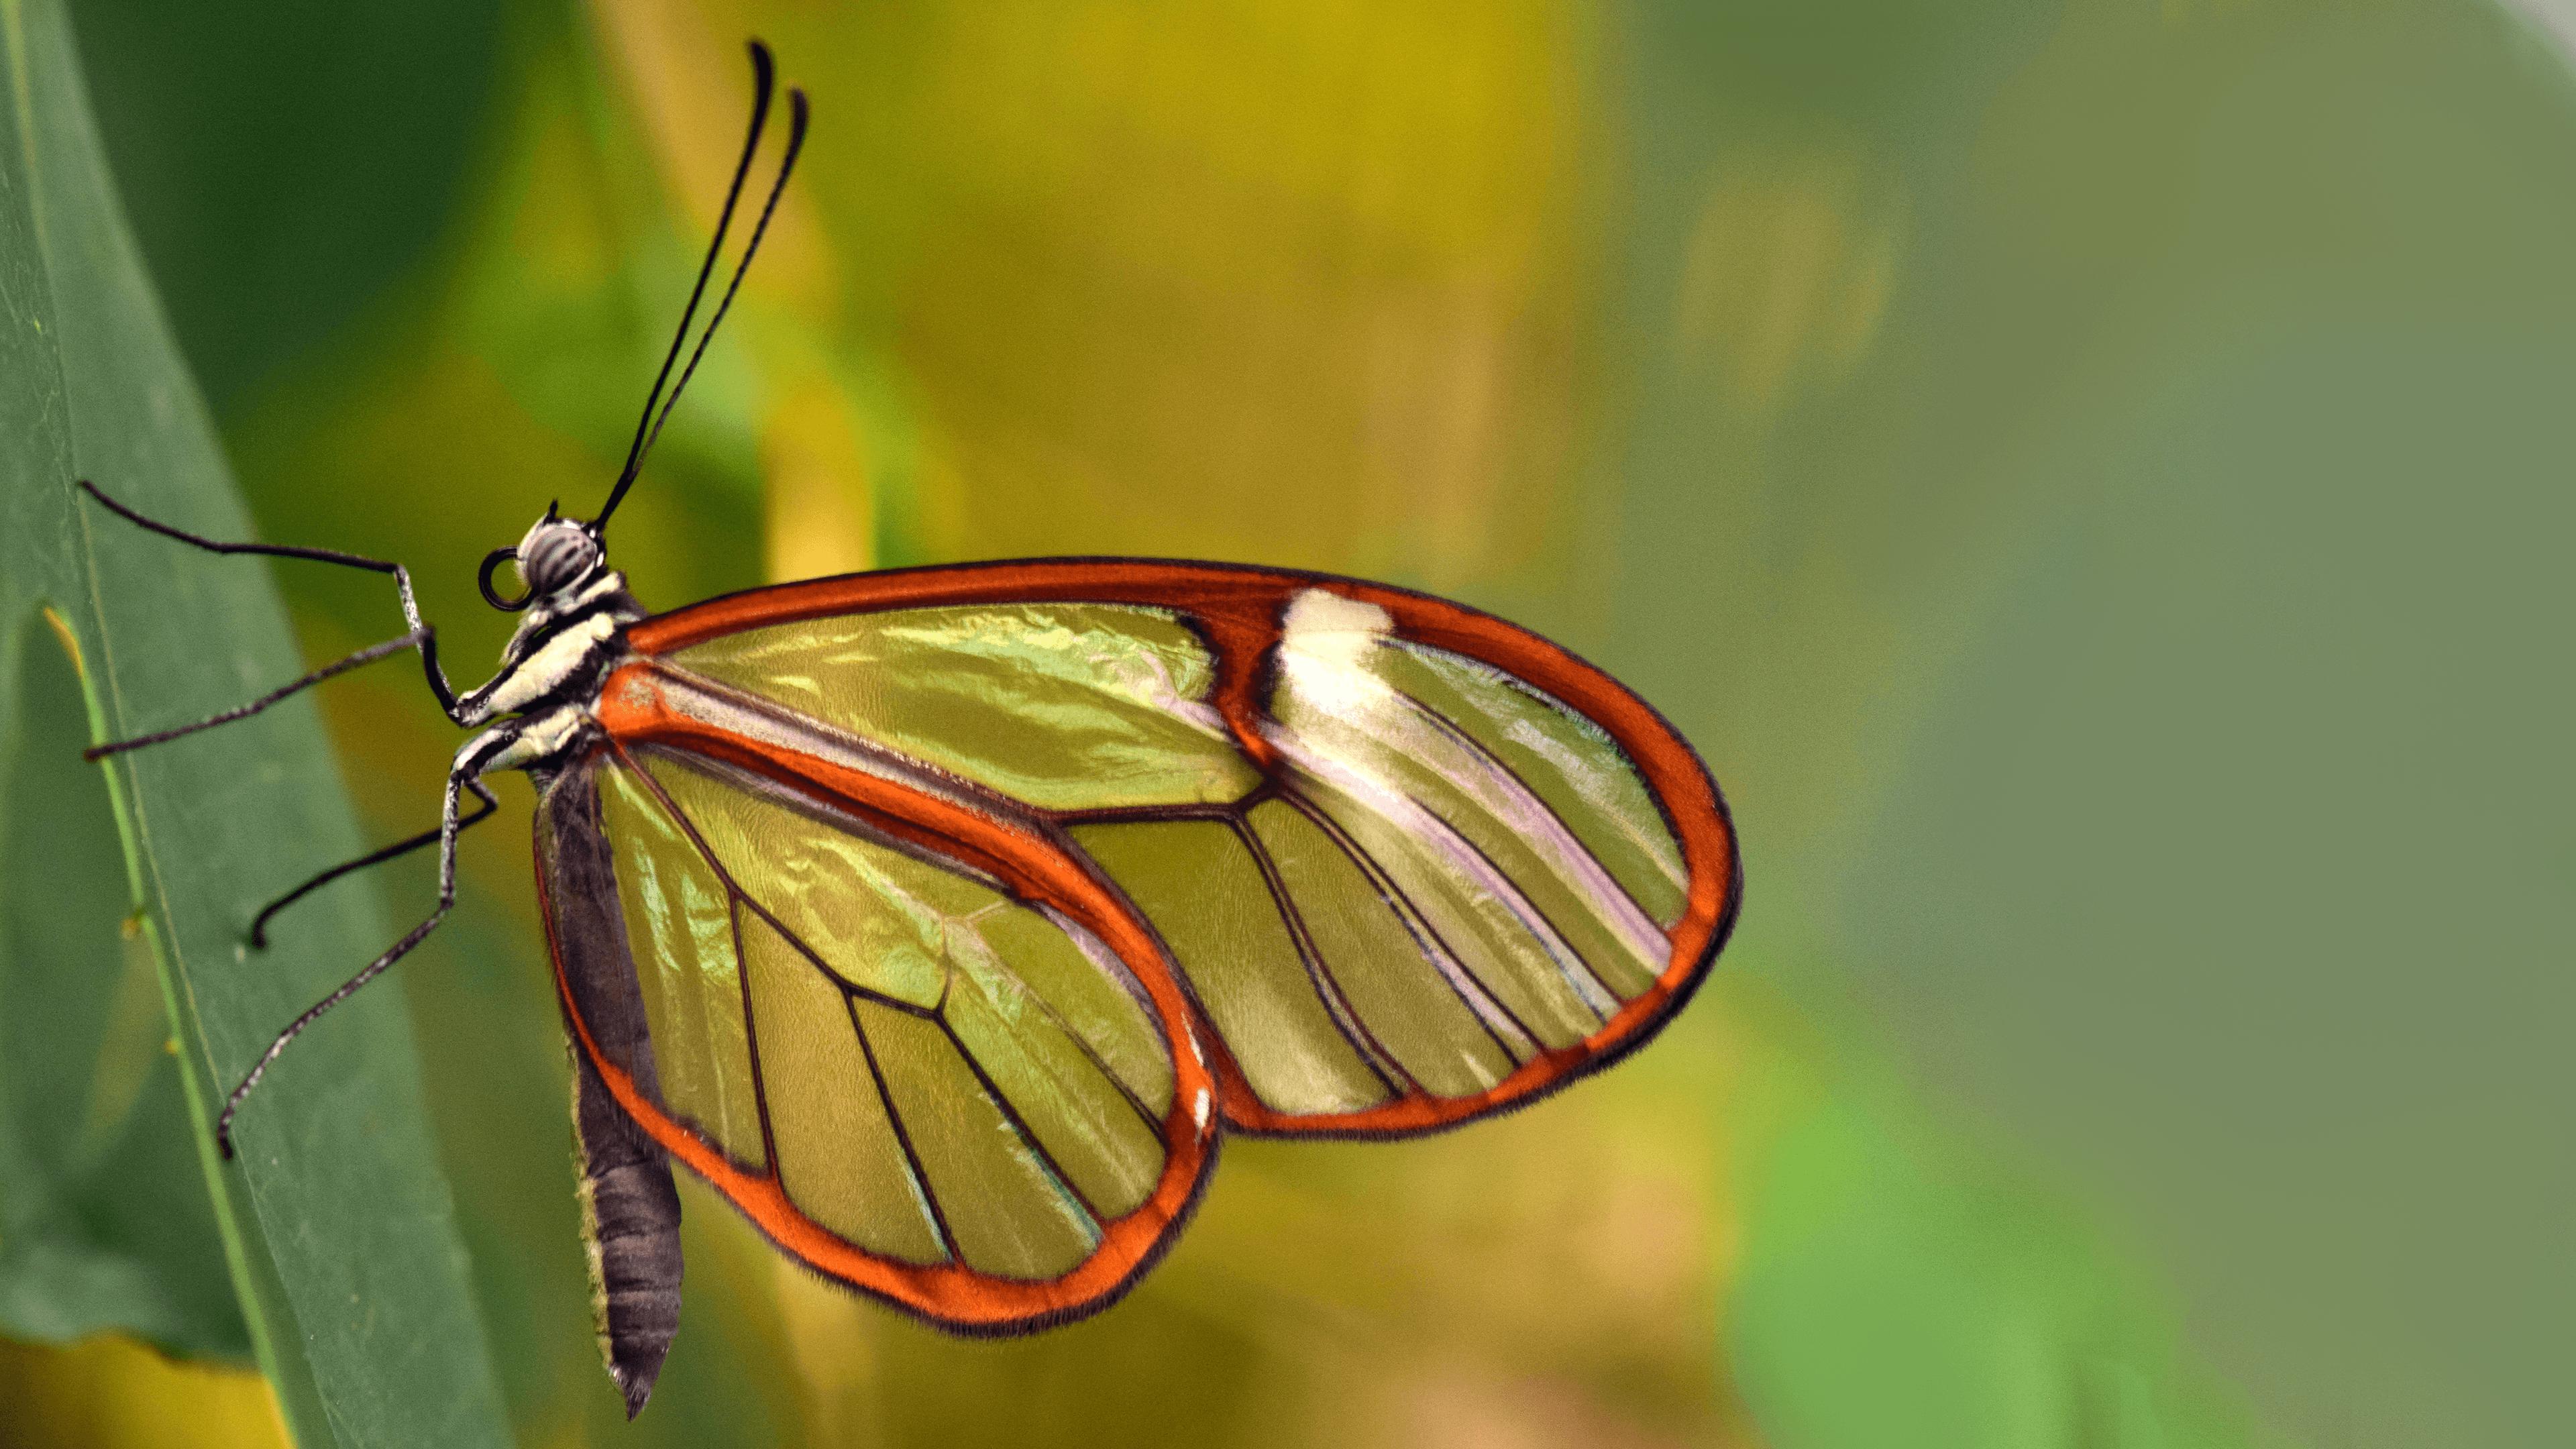 4k Butterfly Wallpapers Top Free 4k Butterfly Backgrounds